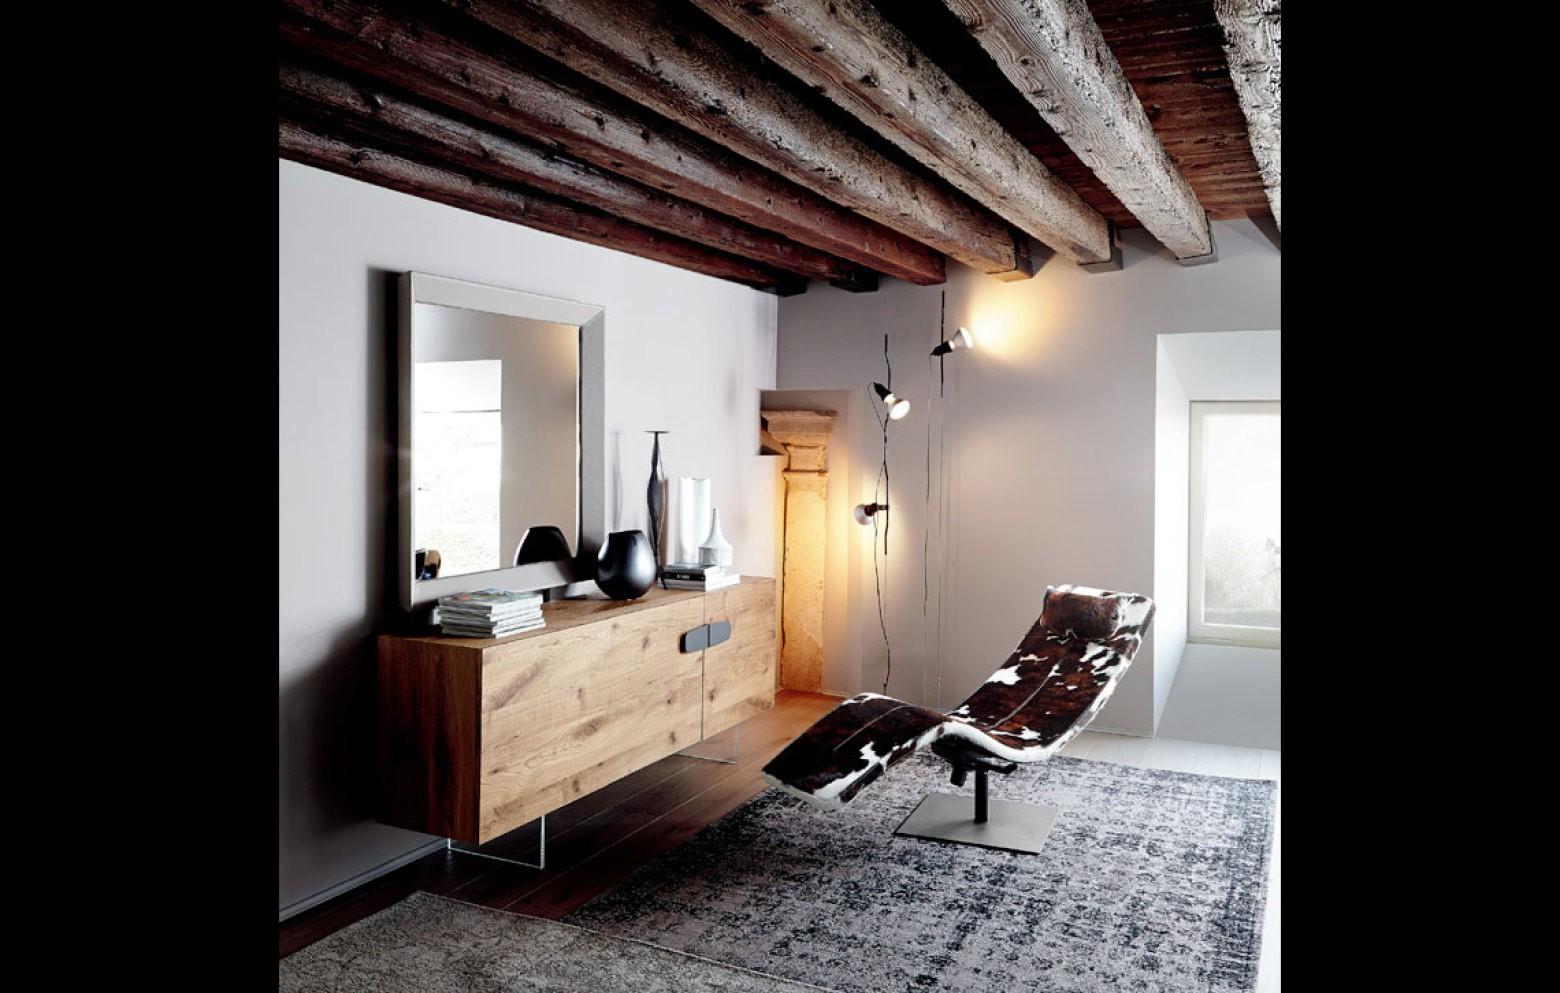 nebraska sideboards sideboards wohnw nde who 39 s perfect. Black Bedroom Furniture Sets. Home Design Ideas